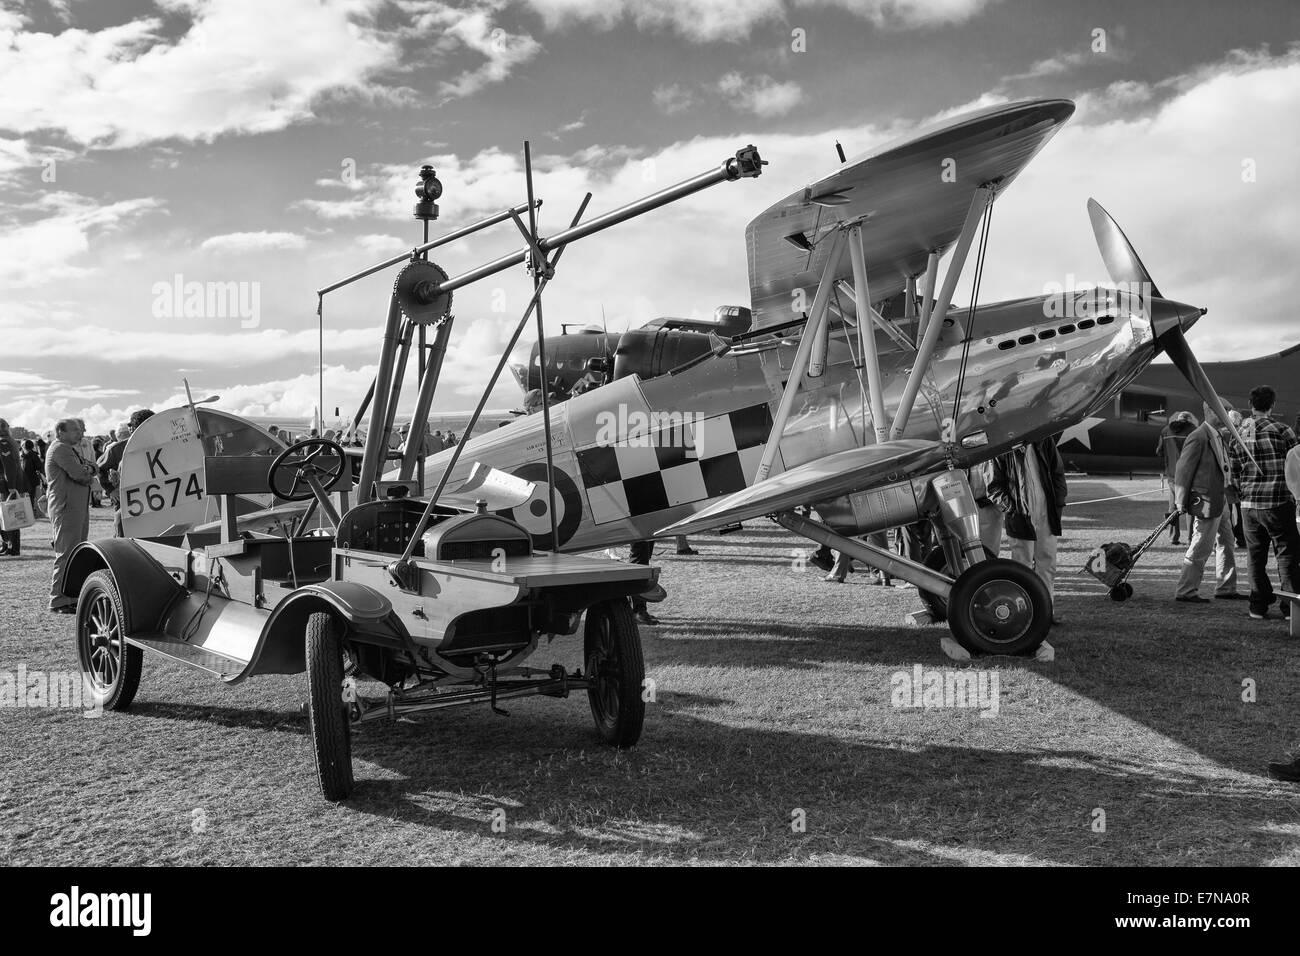 Silver bi plane in black and white - Stock Image